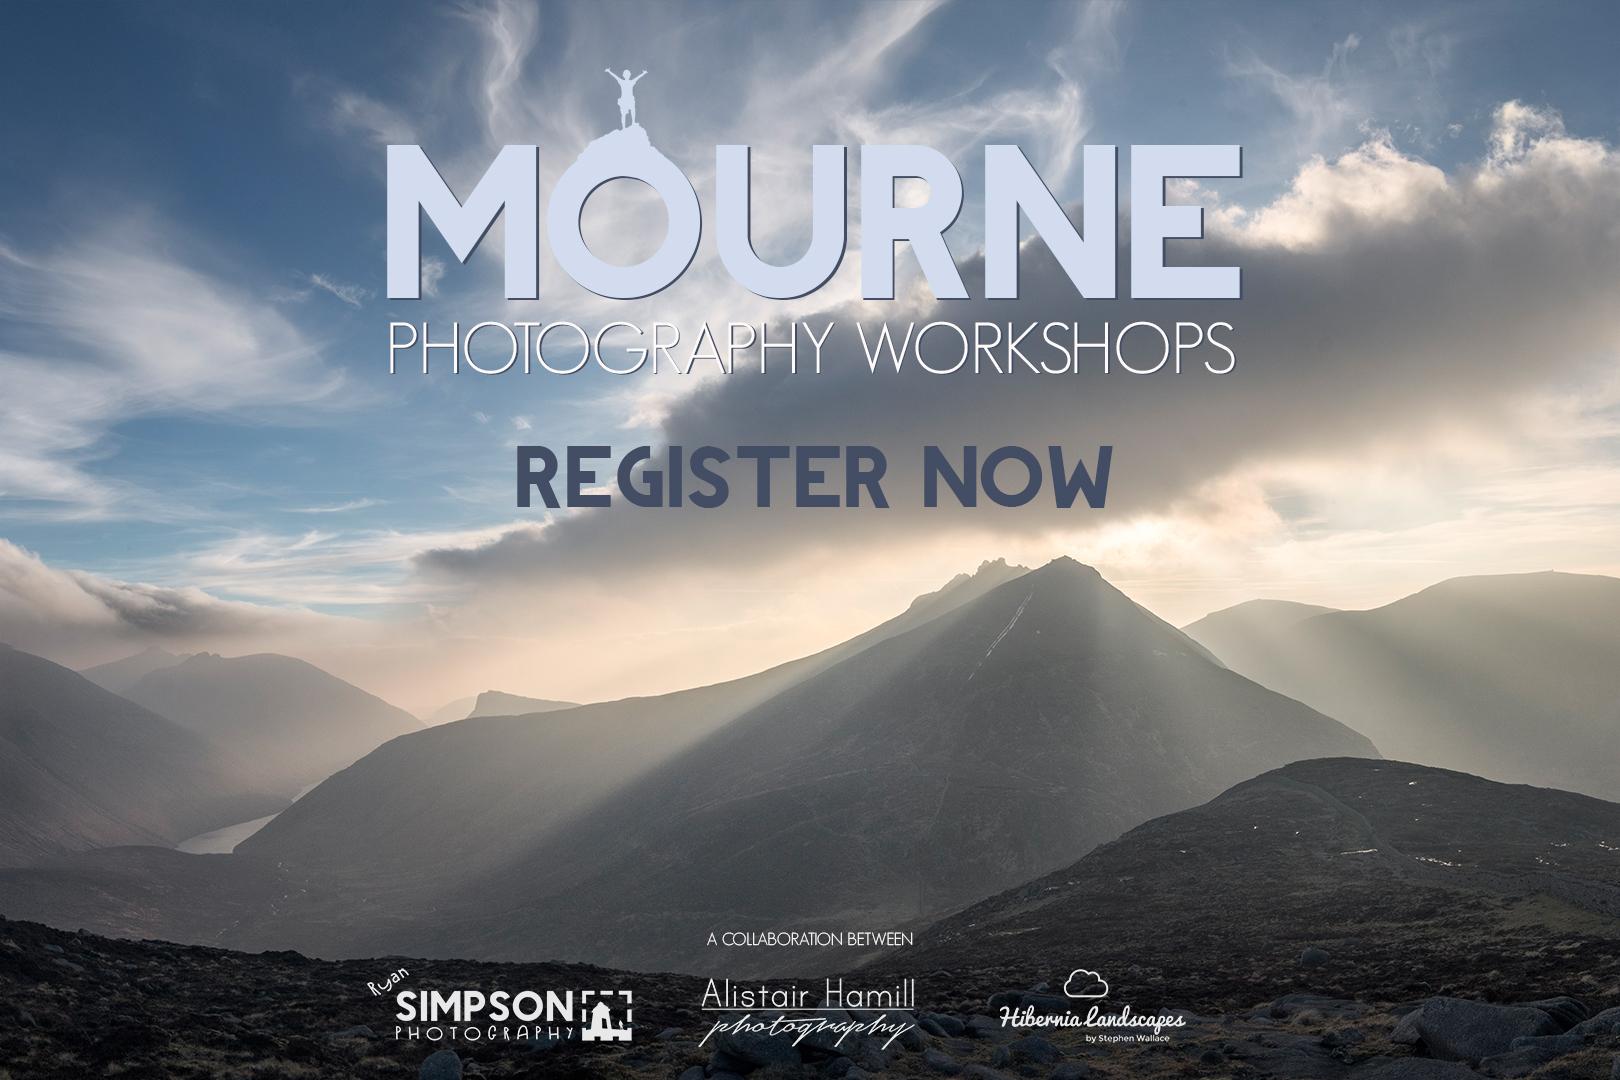 Mourne workshop banner resized for web.jpg